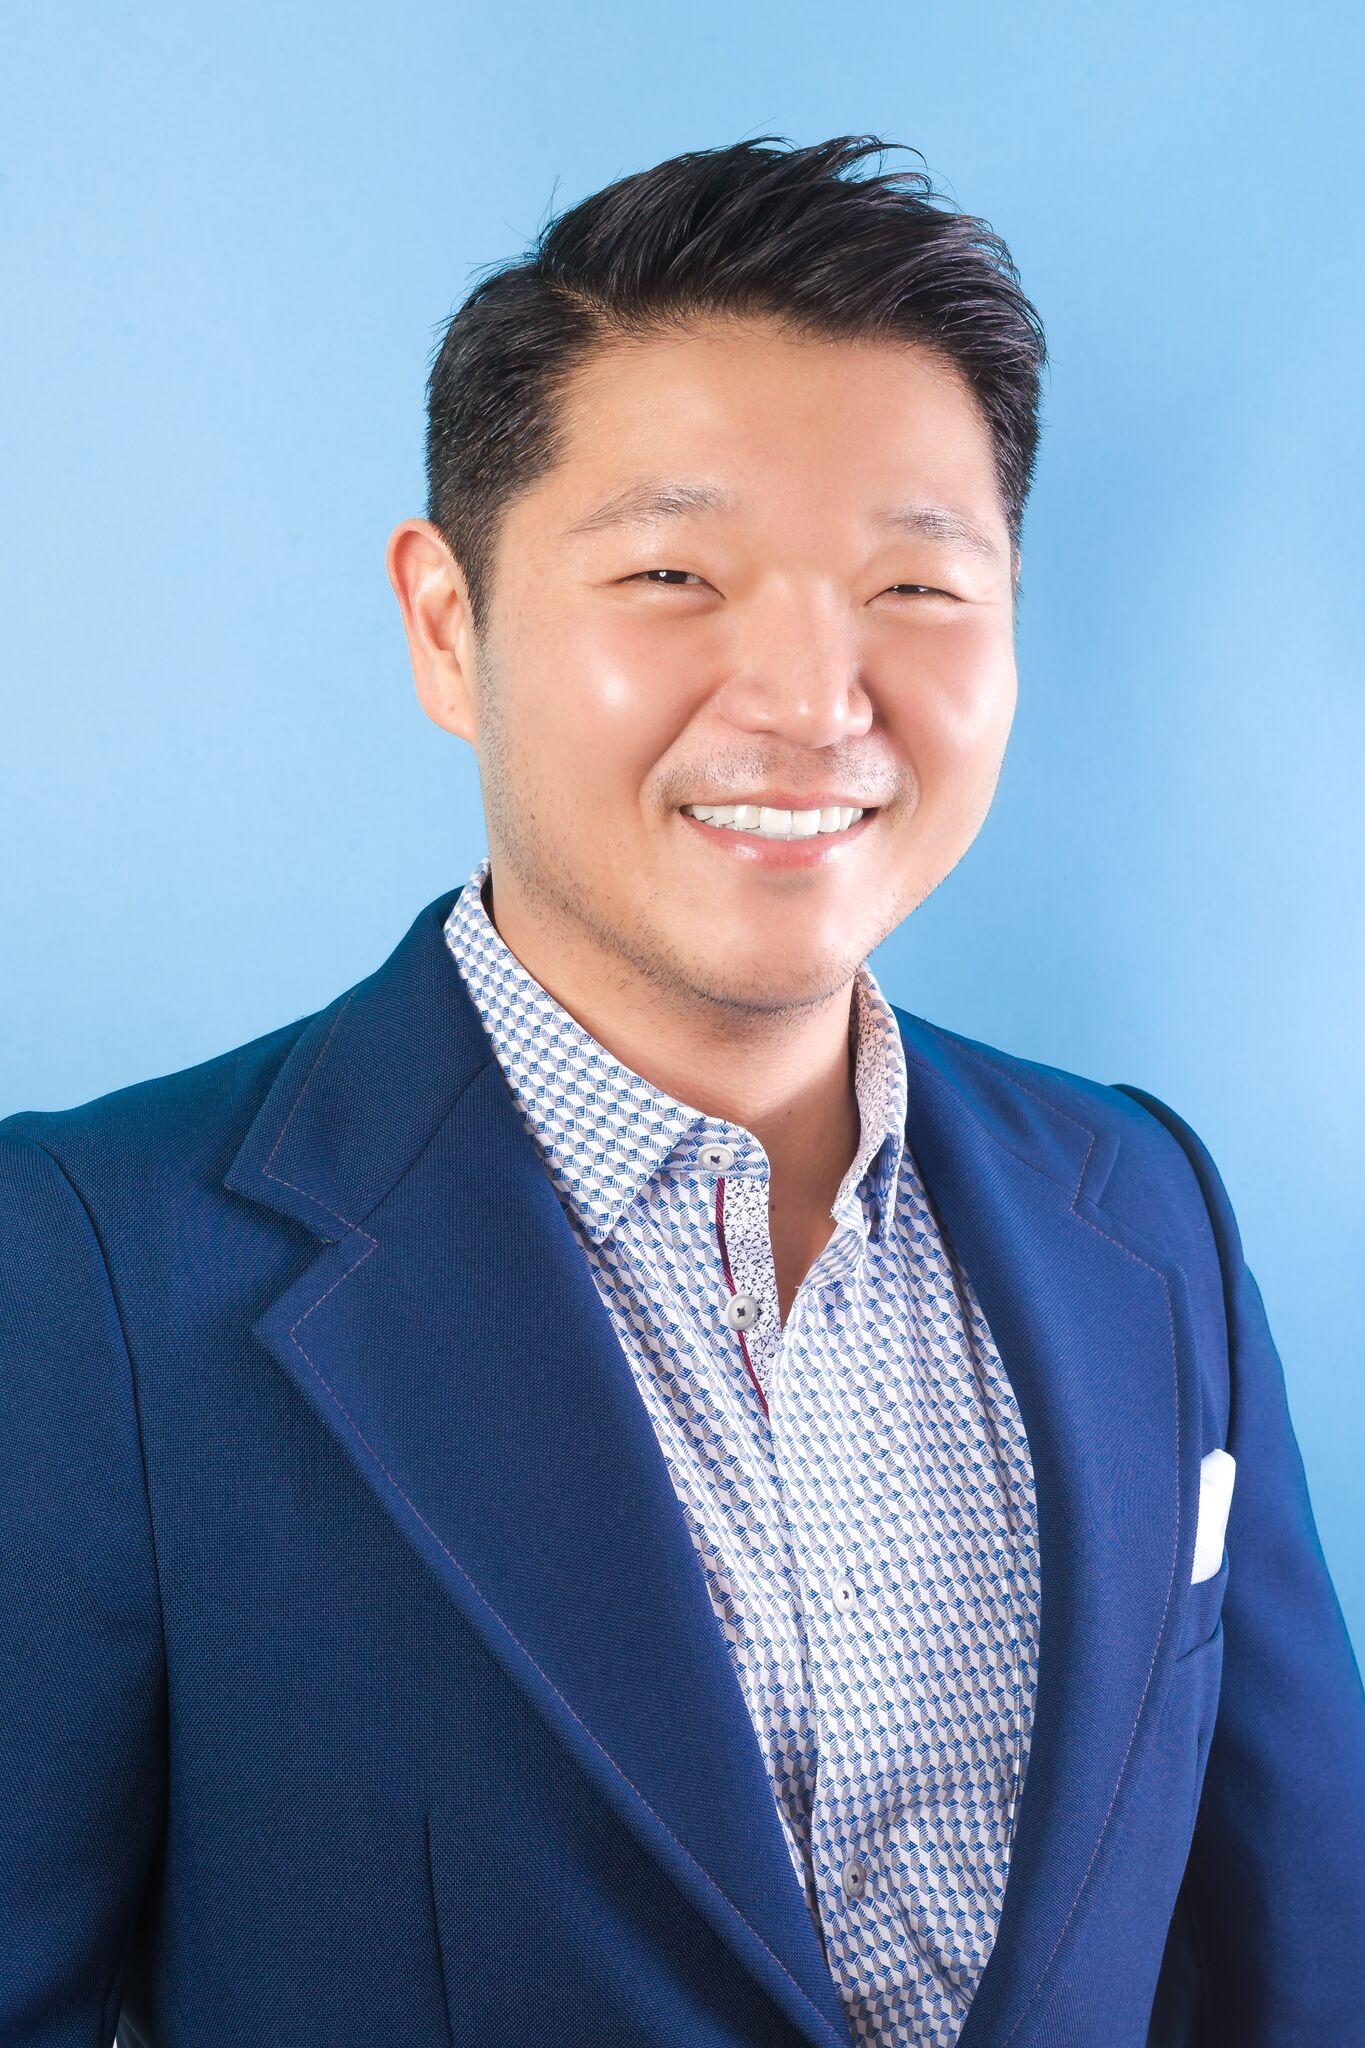 Bio Photo of Ozzy Kim Owner of Ozzy K Designs (ozzykdesigns), a premier, award winning interior design agency in Las Vegas Nevada